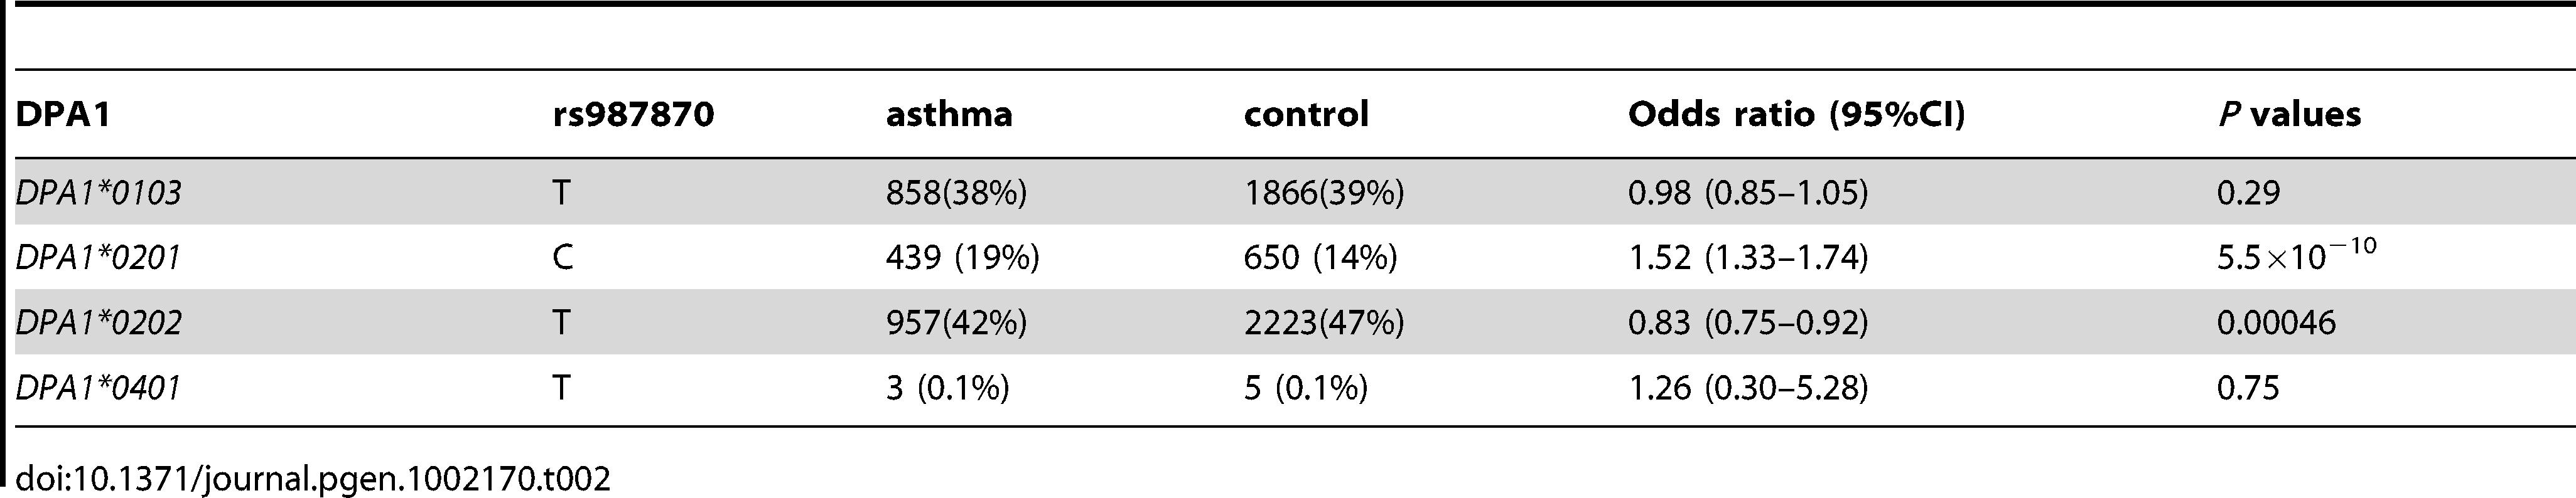 HLA-DPA1-rs987870 Haplotype analysis of pediatric asthma.